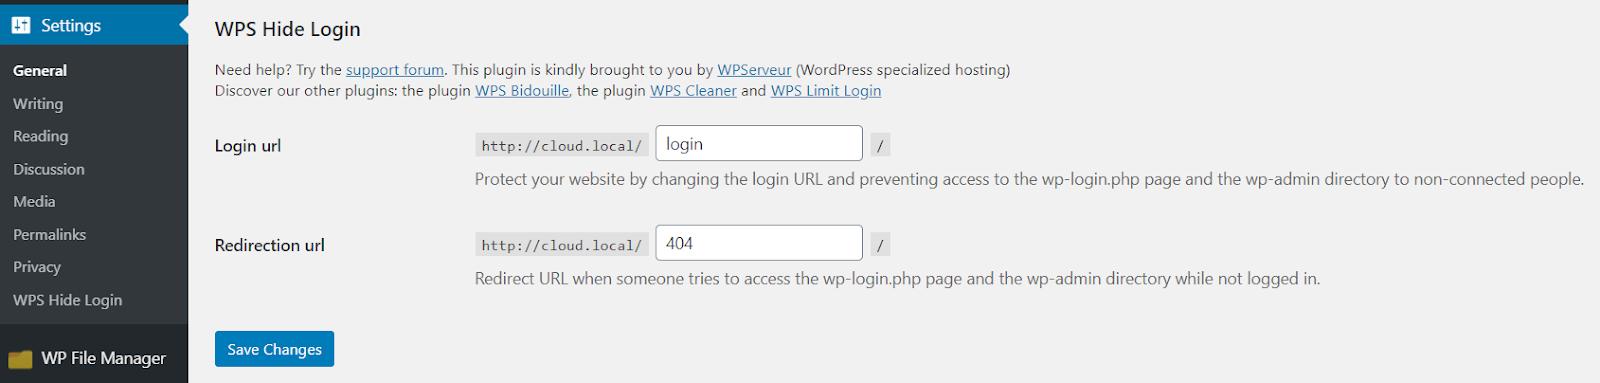 Change WordPress login page URL